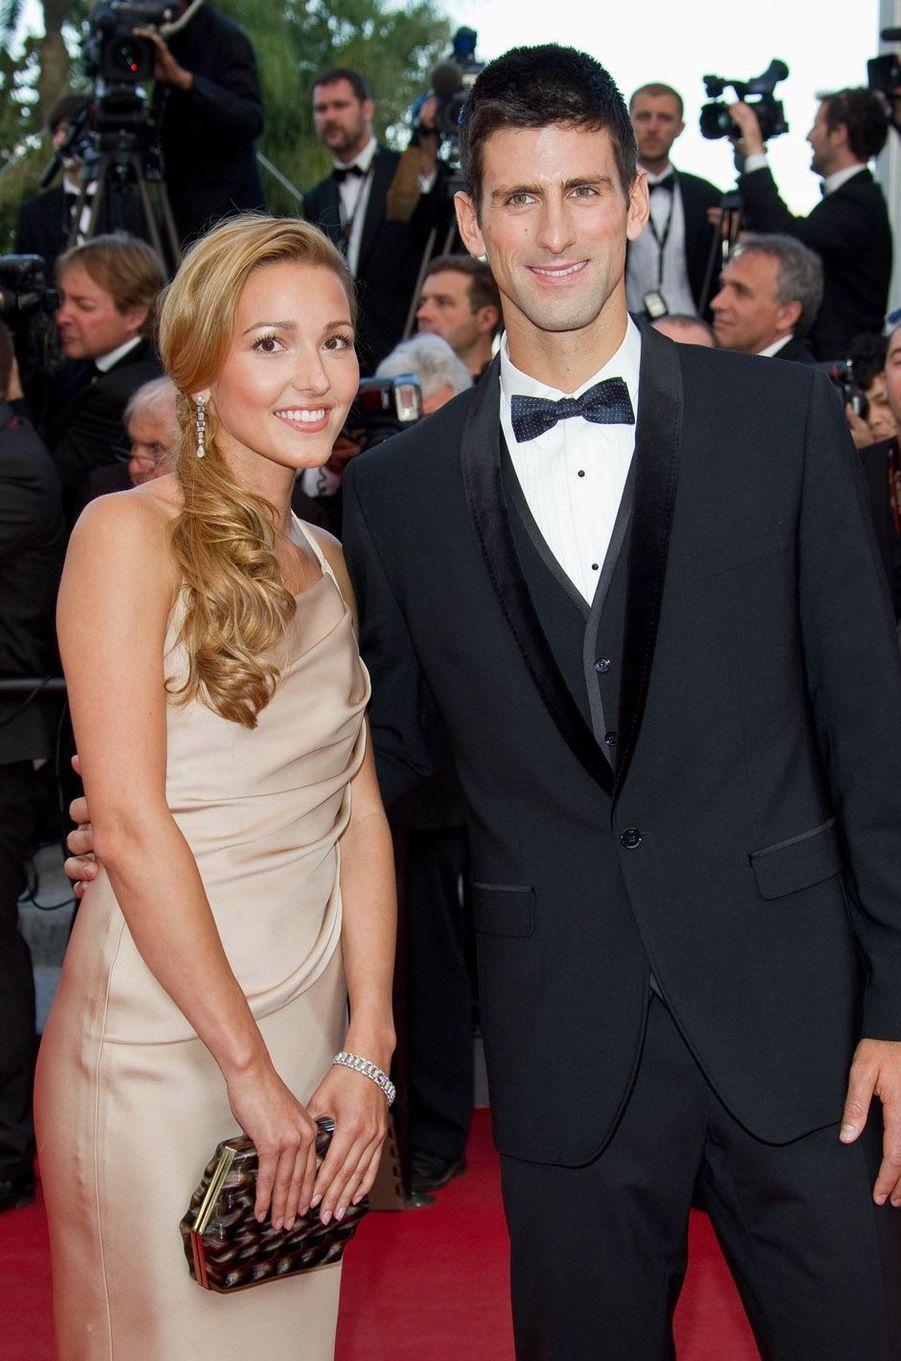 Novak et JelenaDjokovic ont eu une petite Tara, née le 2 septembre 2017.